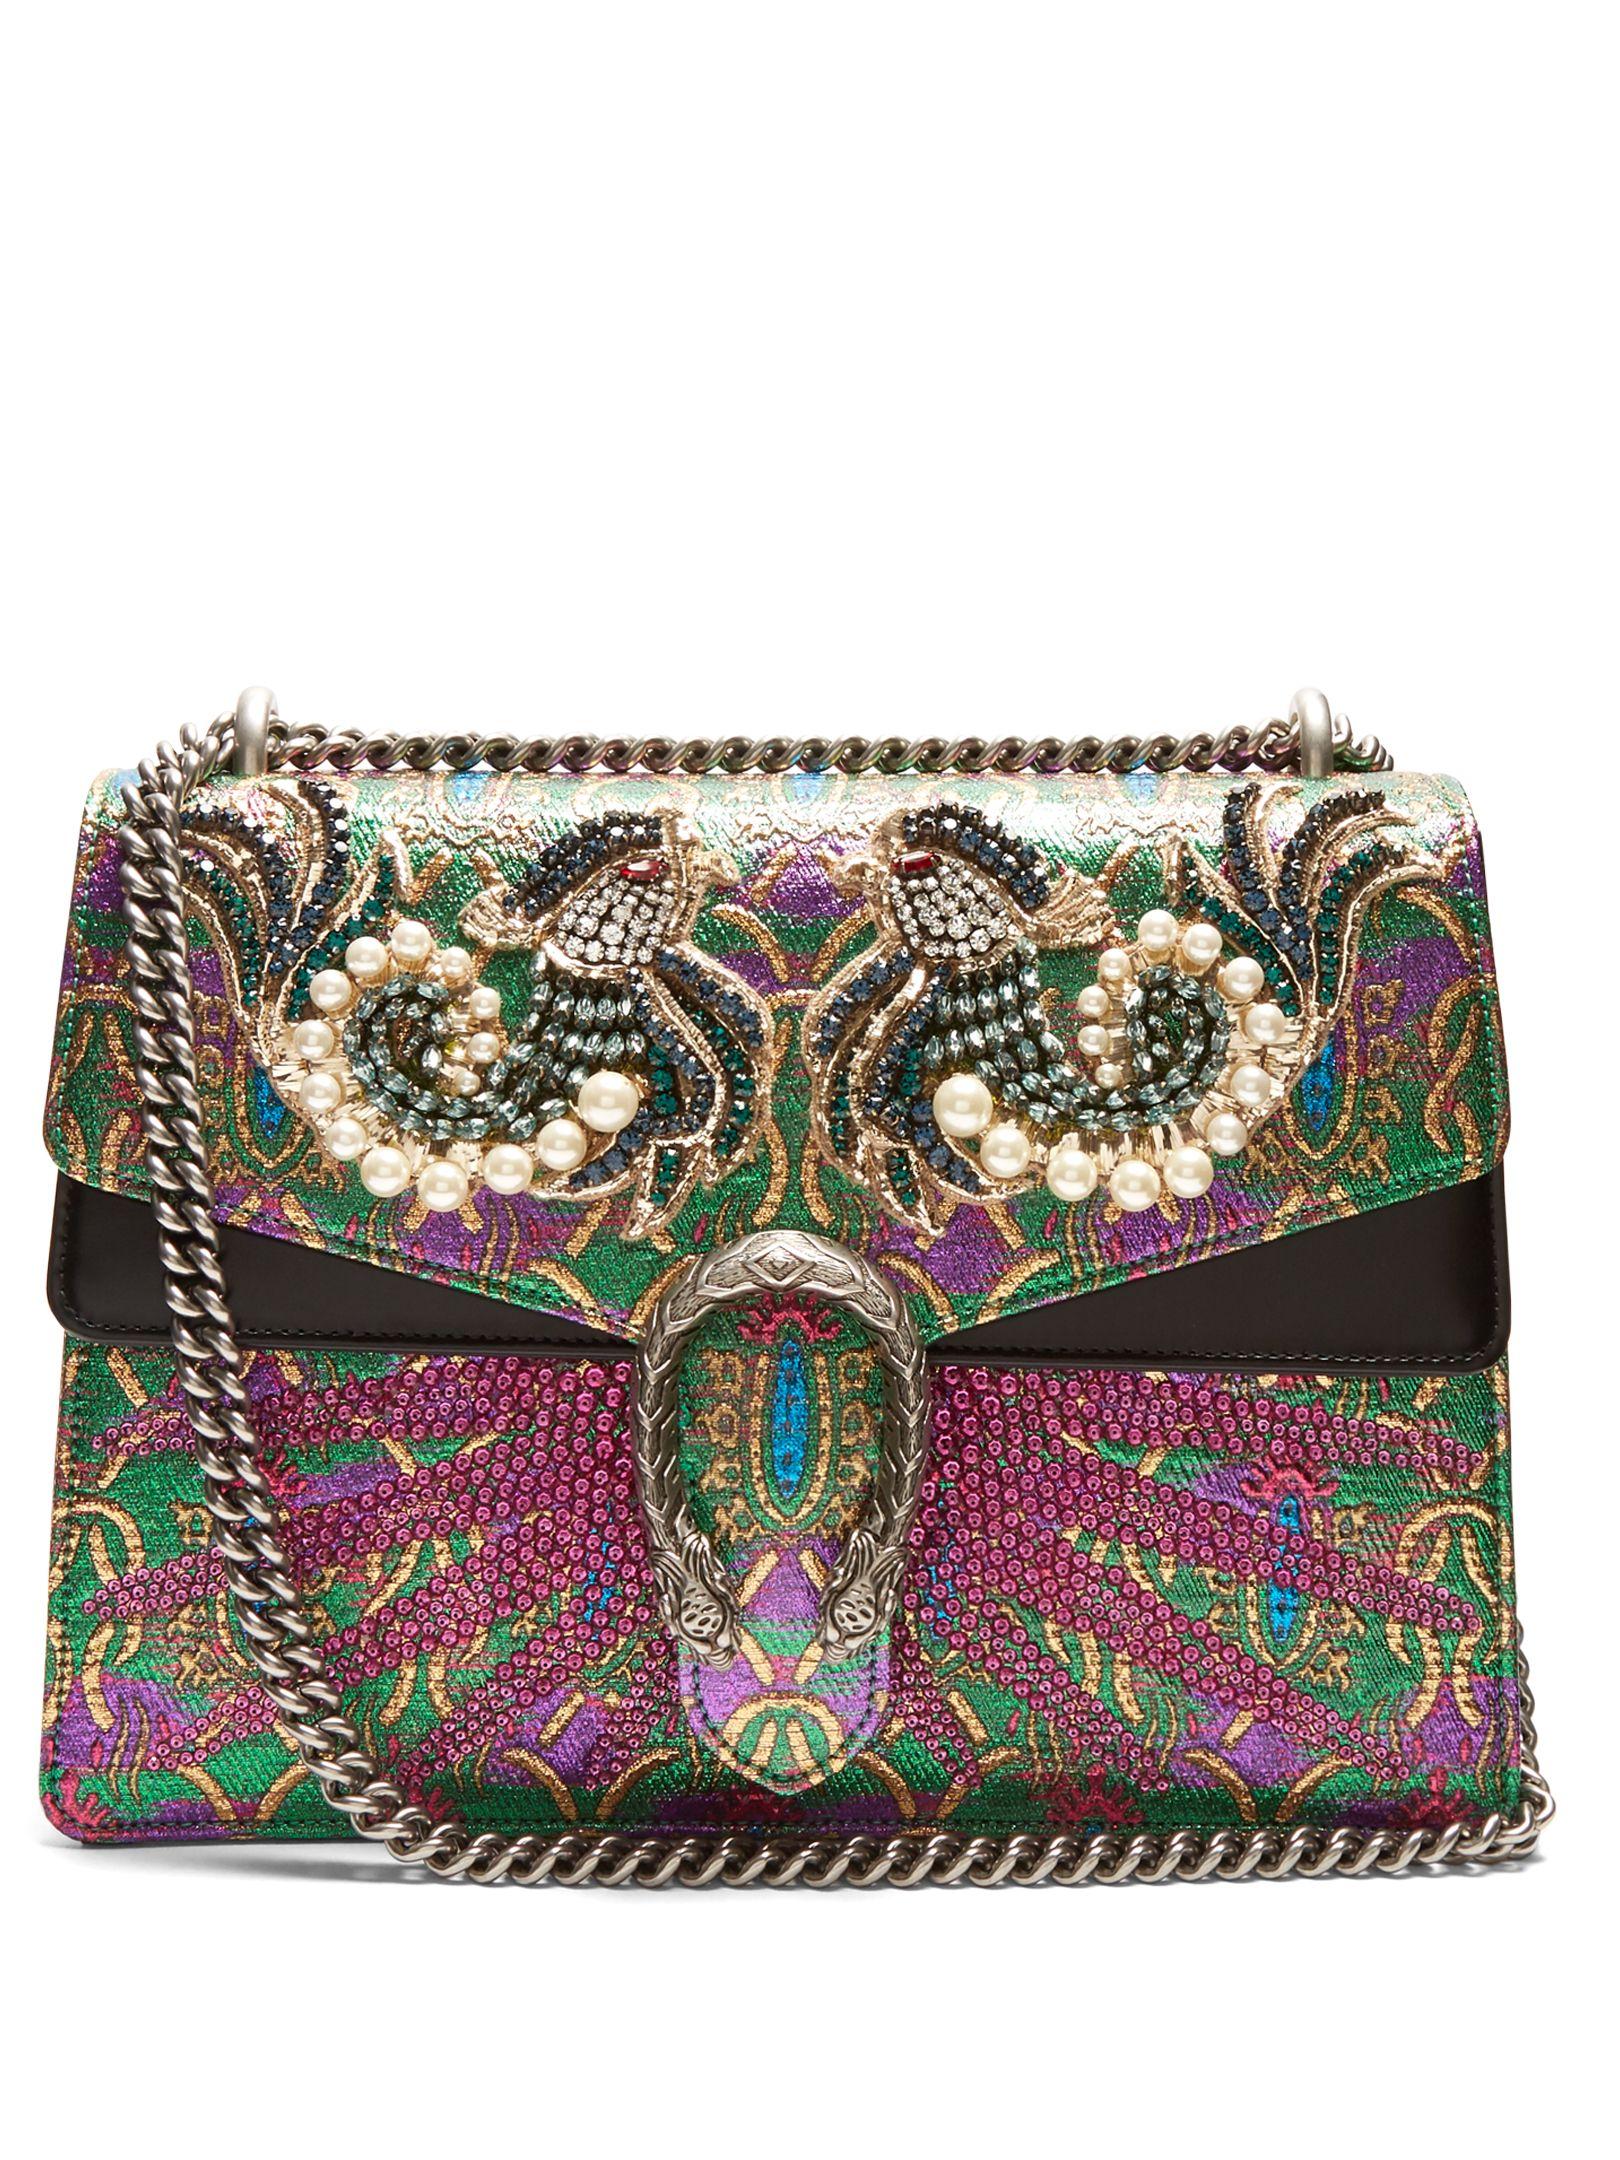 1451579724b4 GUCCI Dionysus embellished brocade shoulder bag | GUCCI Bags | Gucci ...